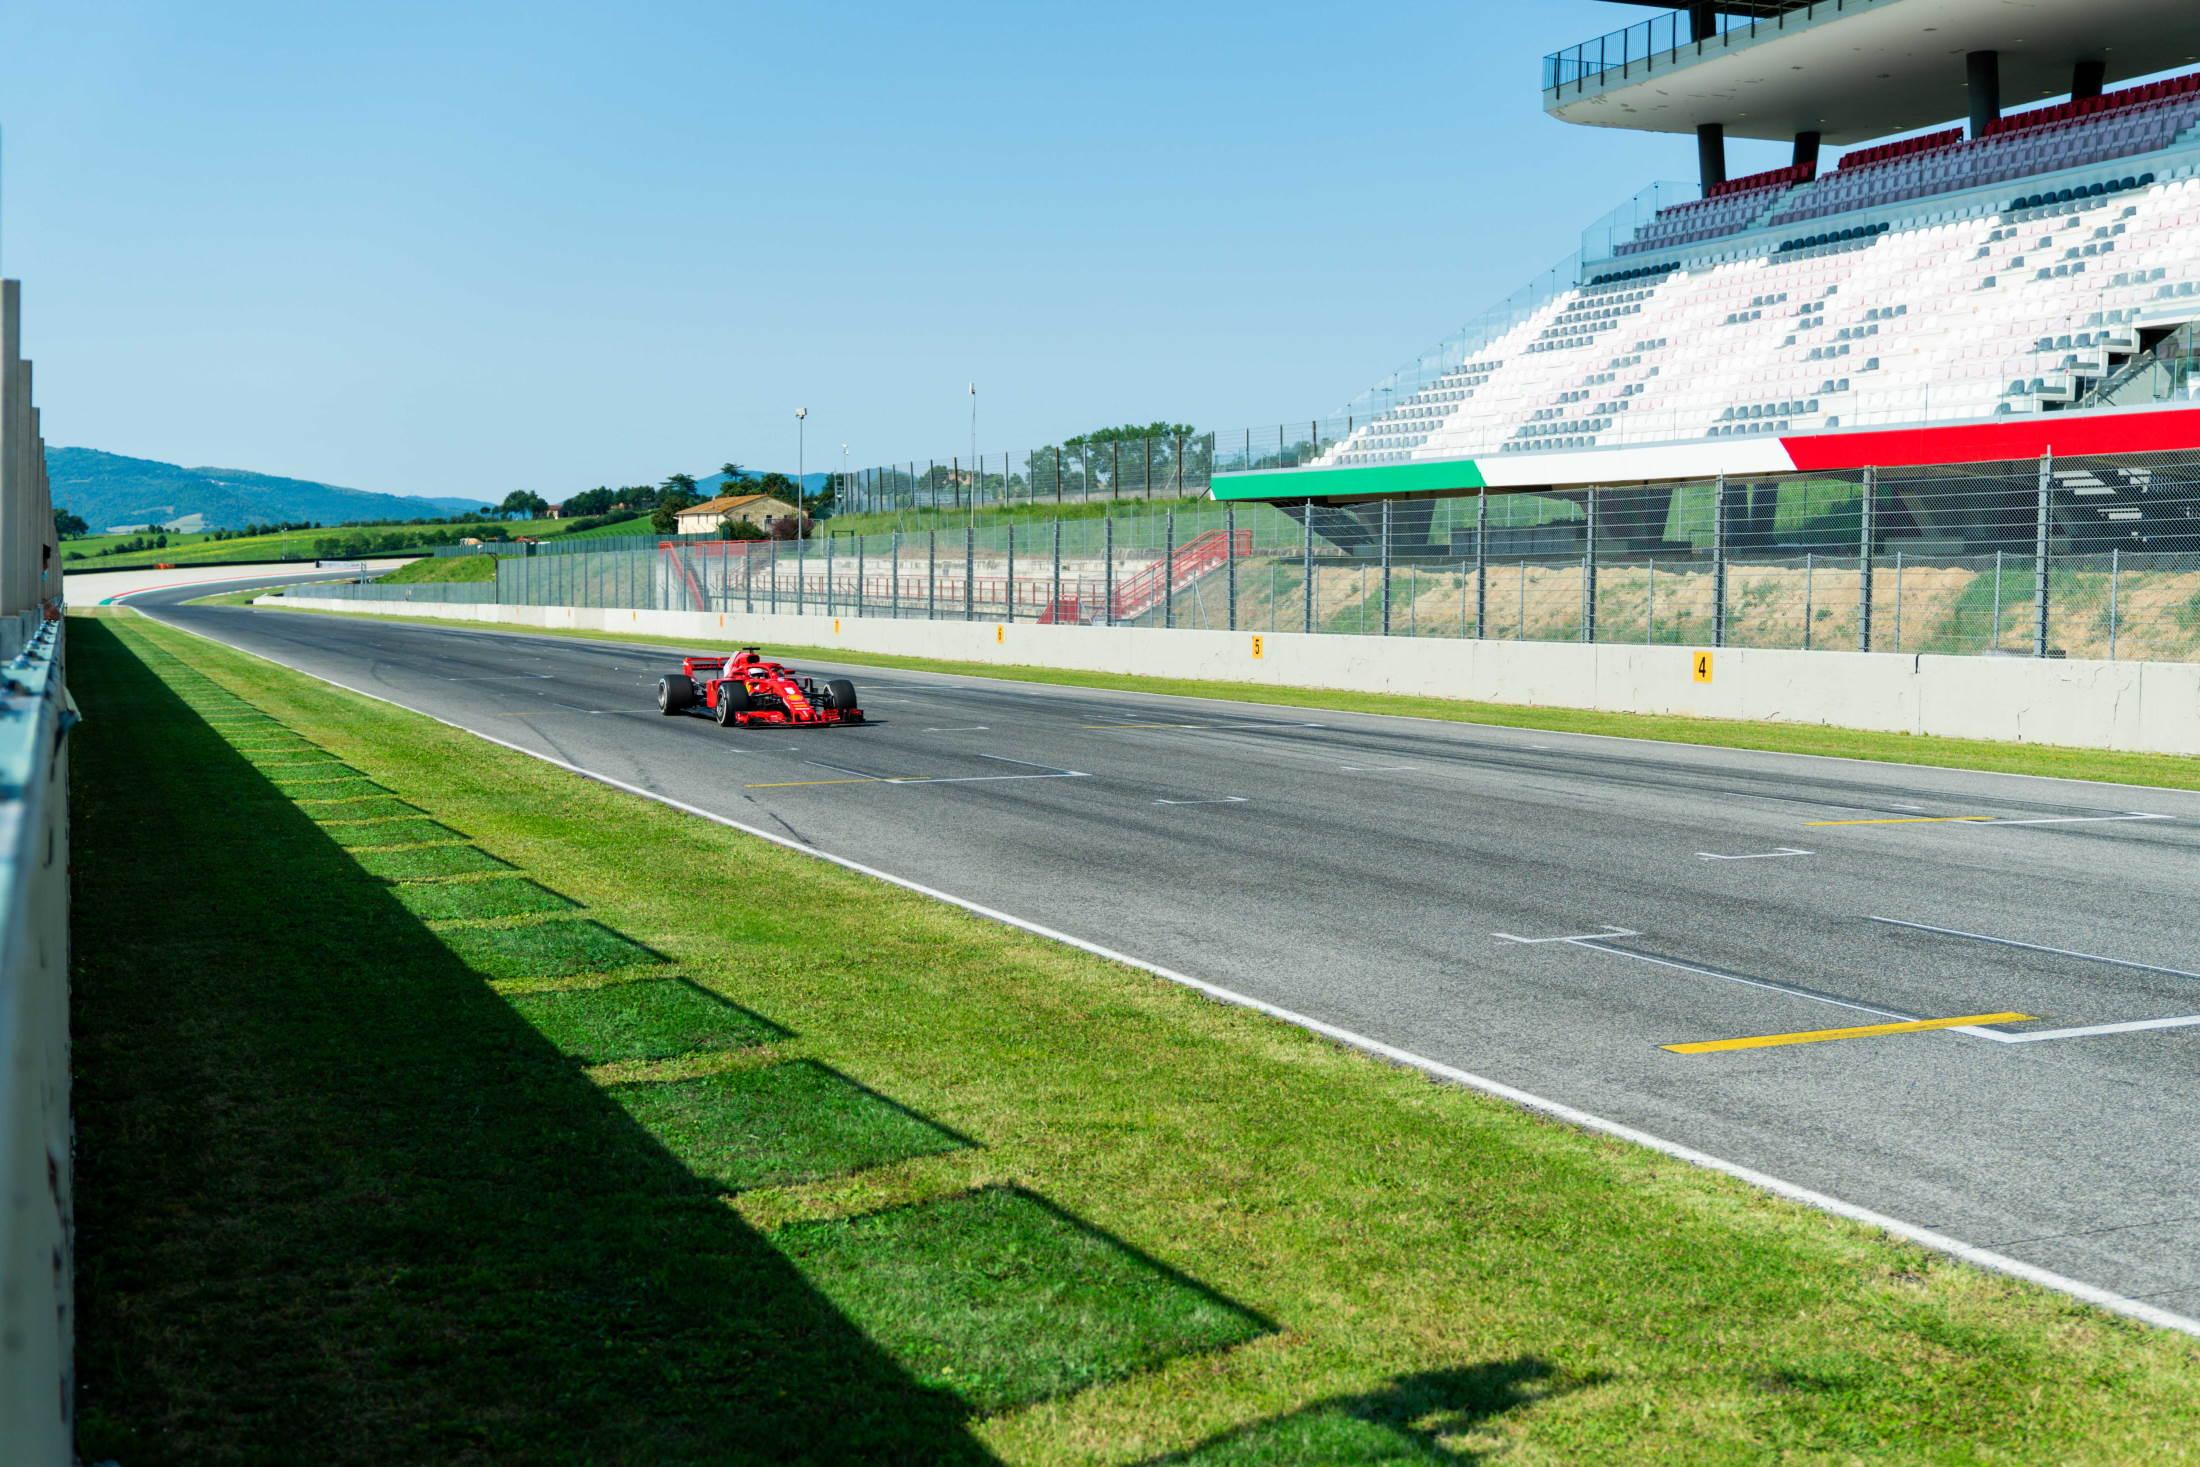 2020 Mugello circuit Vettel Ferrari pre-season test main straight Photo Ferrari